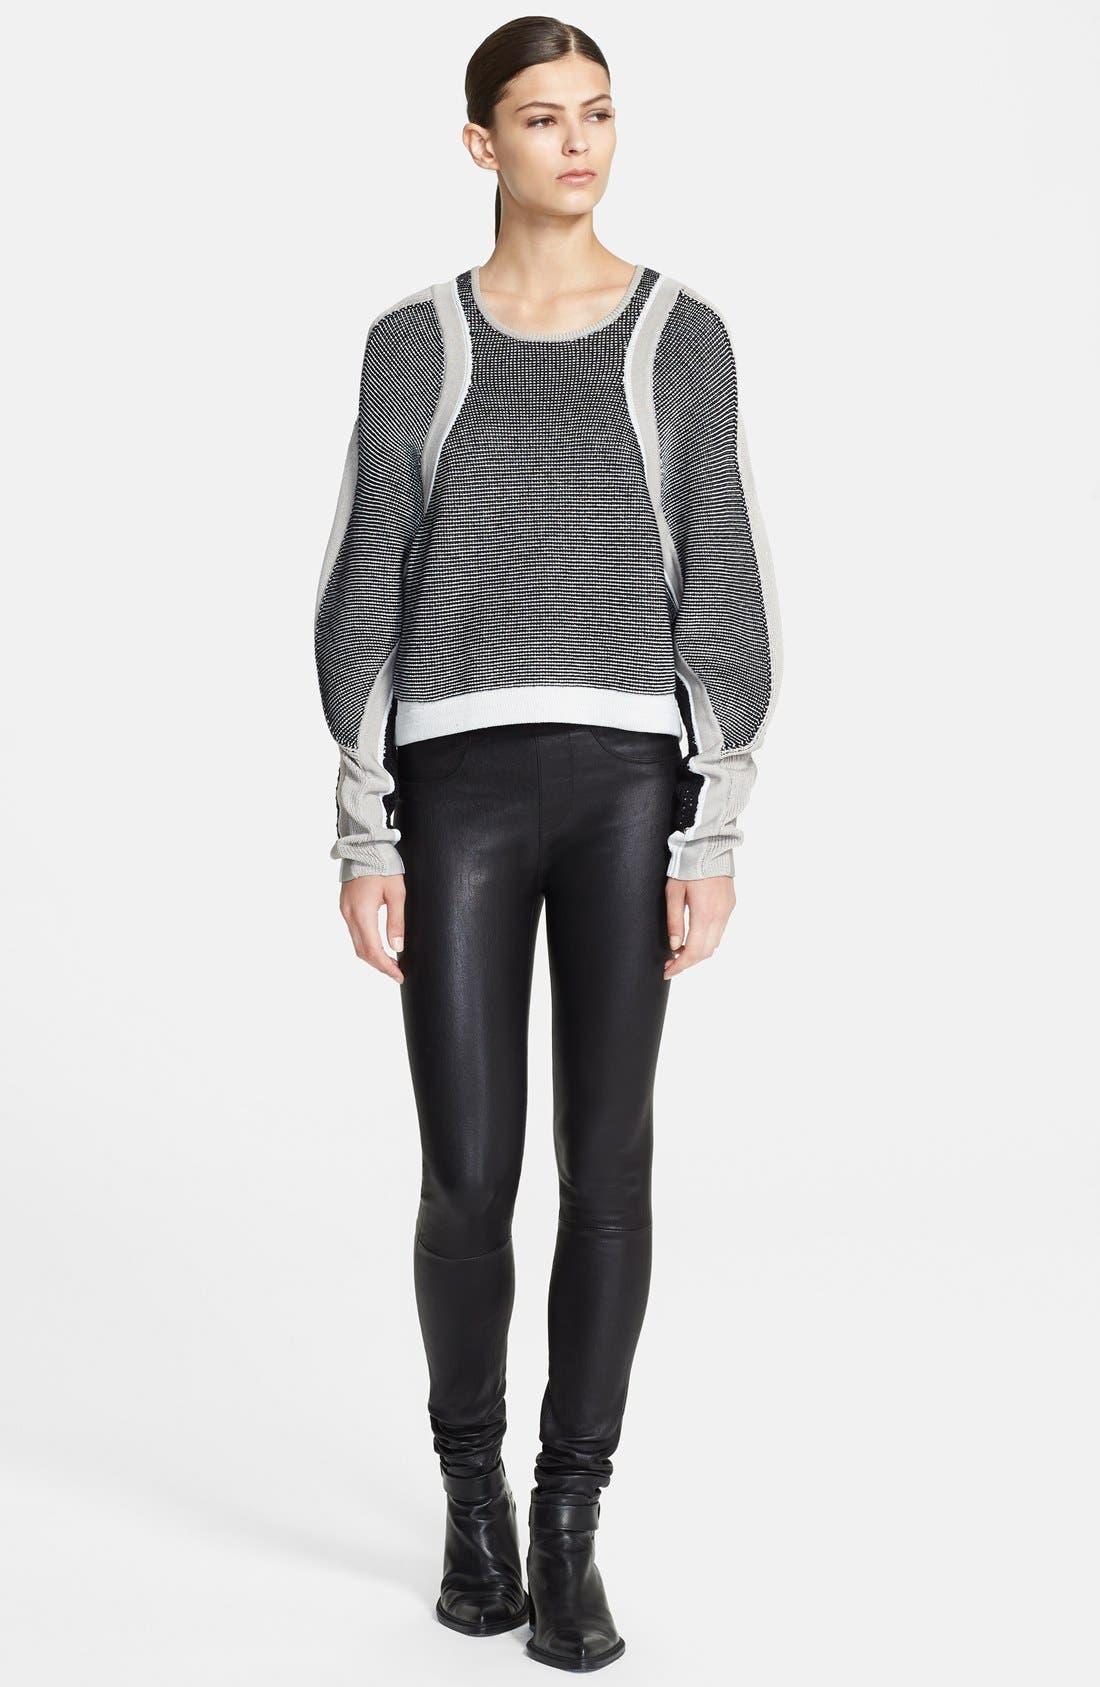 Alternate Image 1 Selected - Helmut Lang 'Converging Panels' Sweater